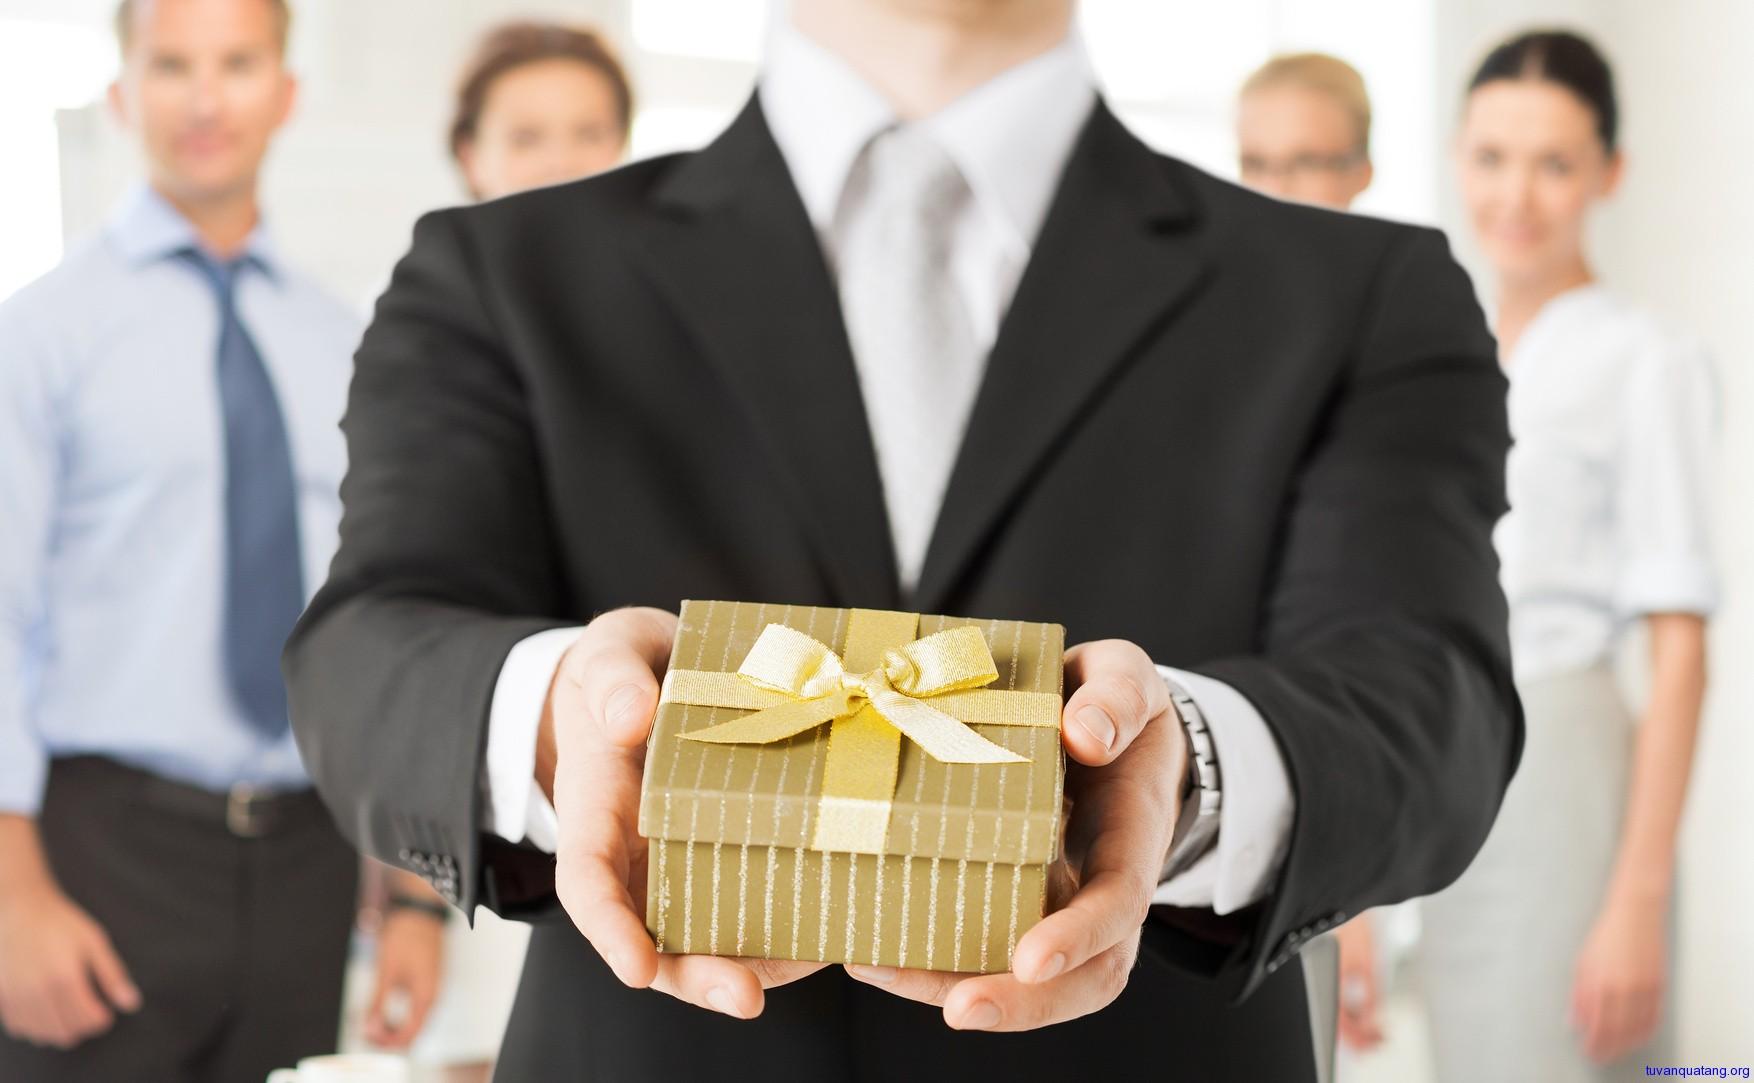 quà trung thu biếu sếp